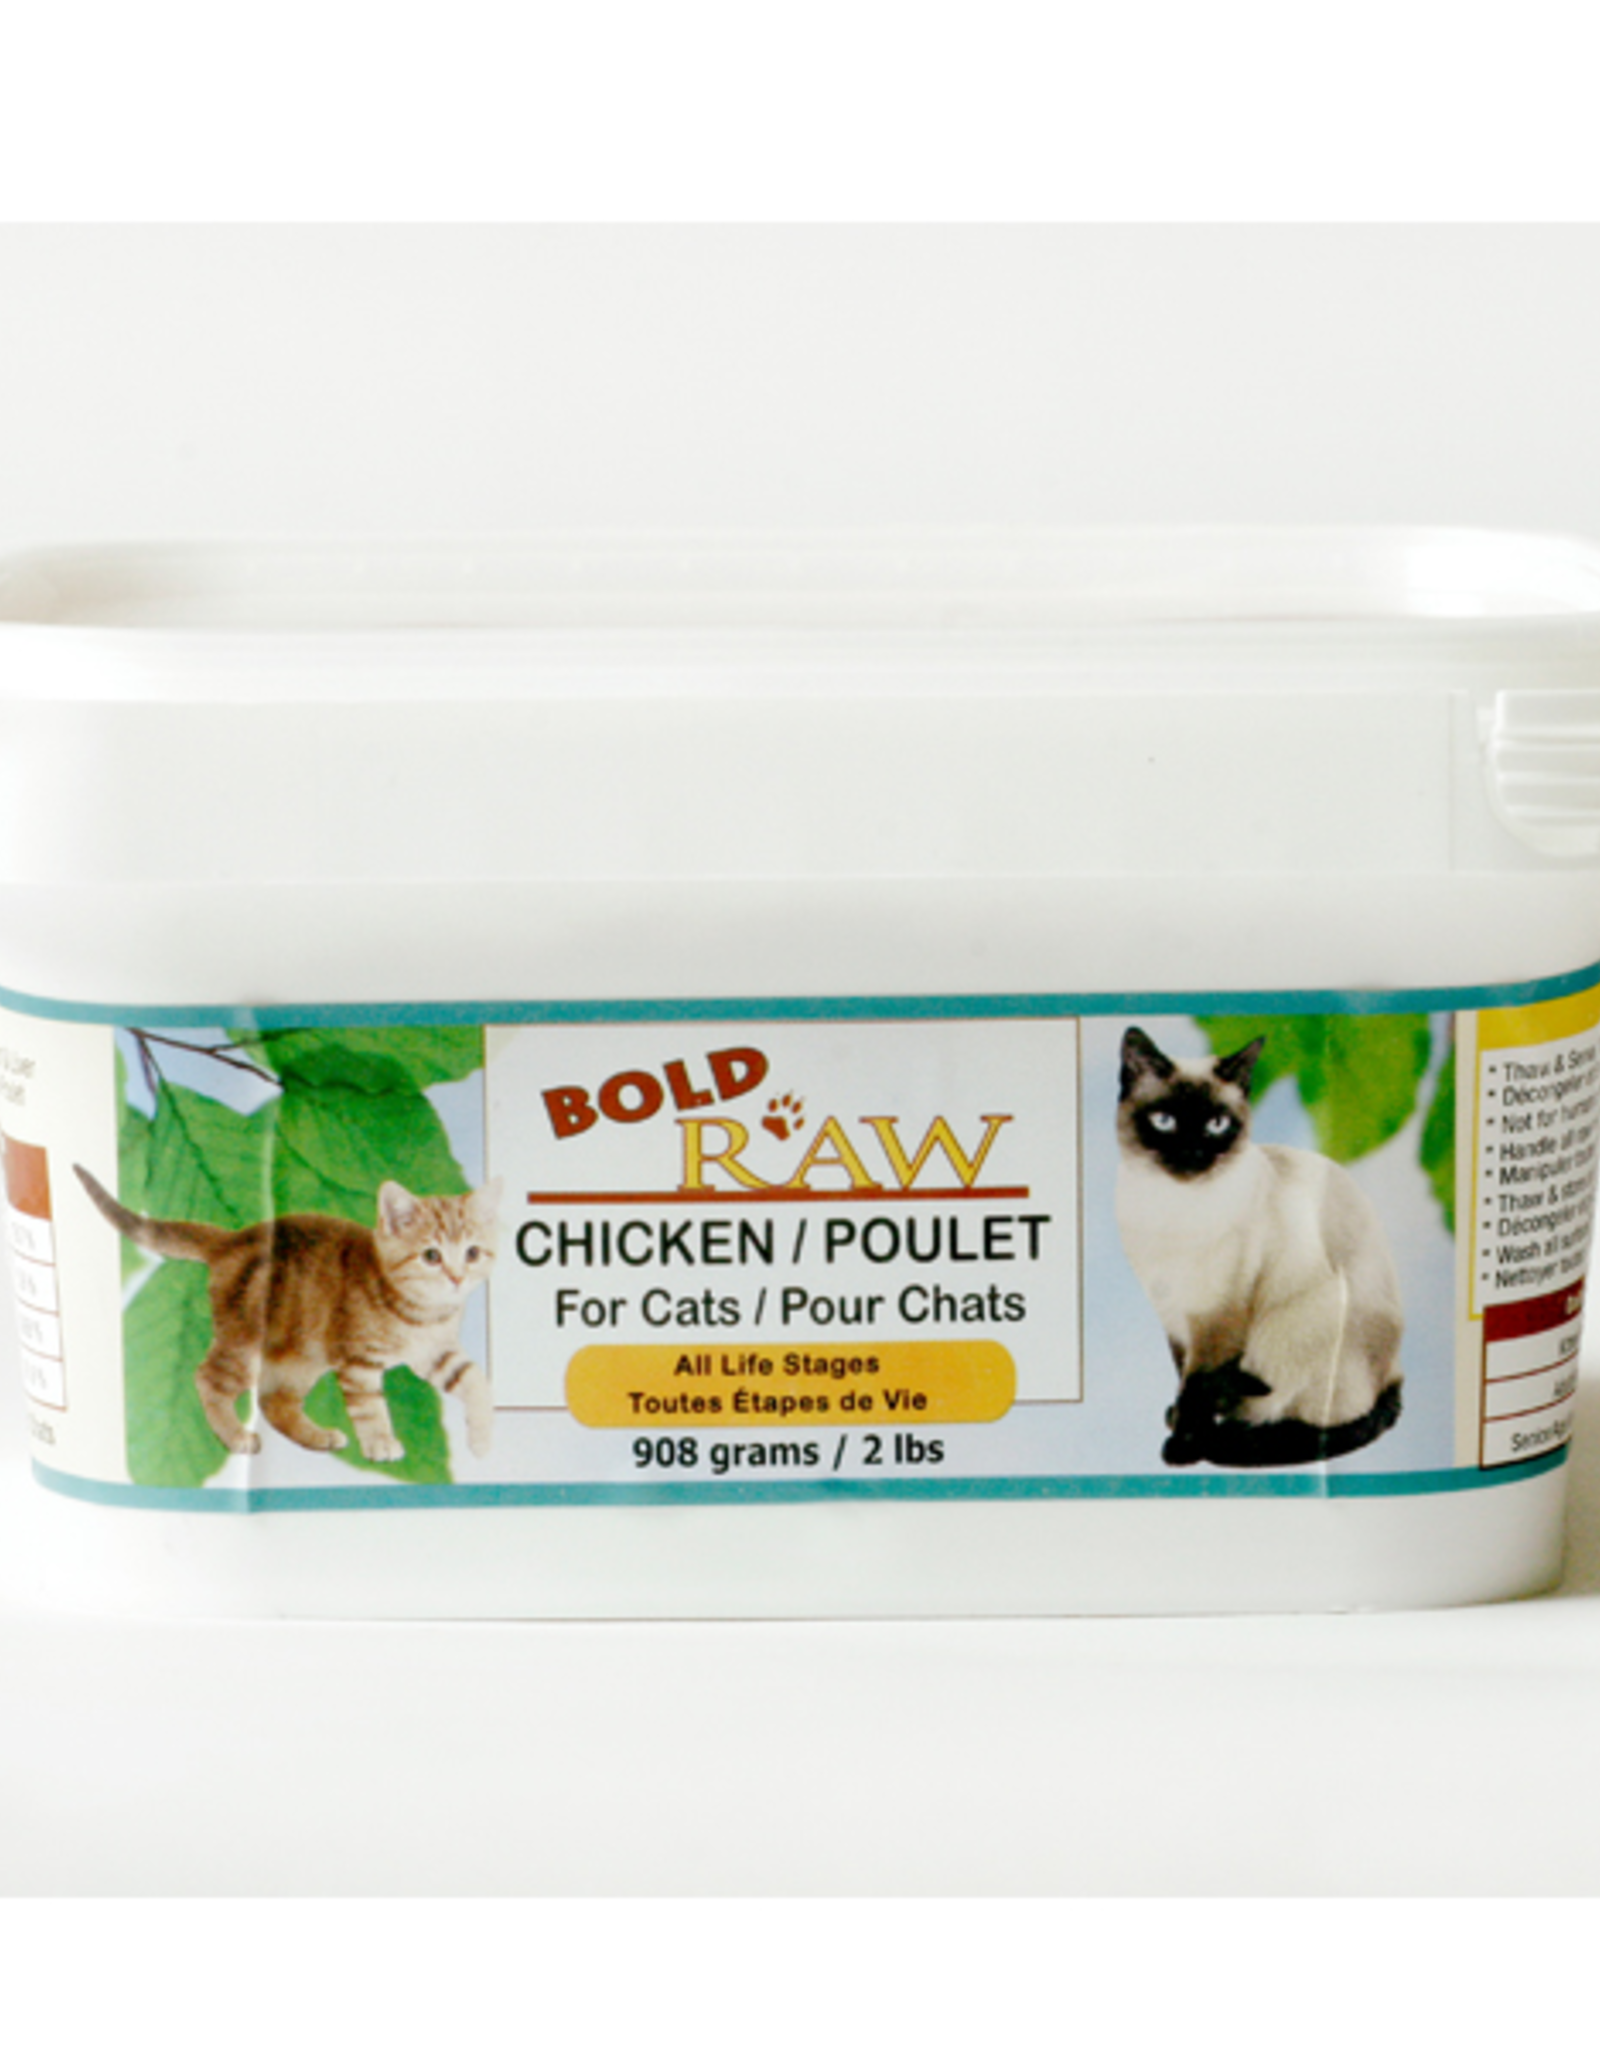 Bold Raw Bold Raw Cat Chicken Tub 2 lb